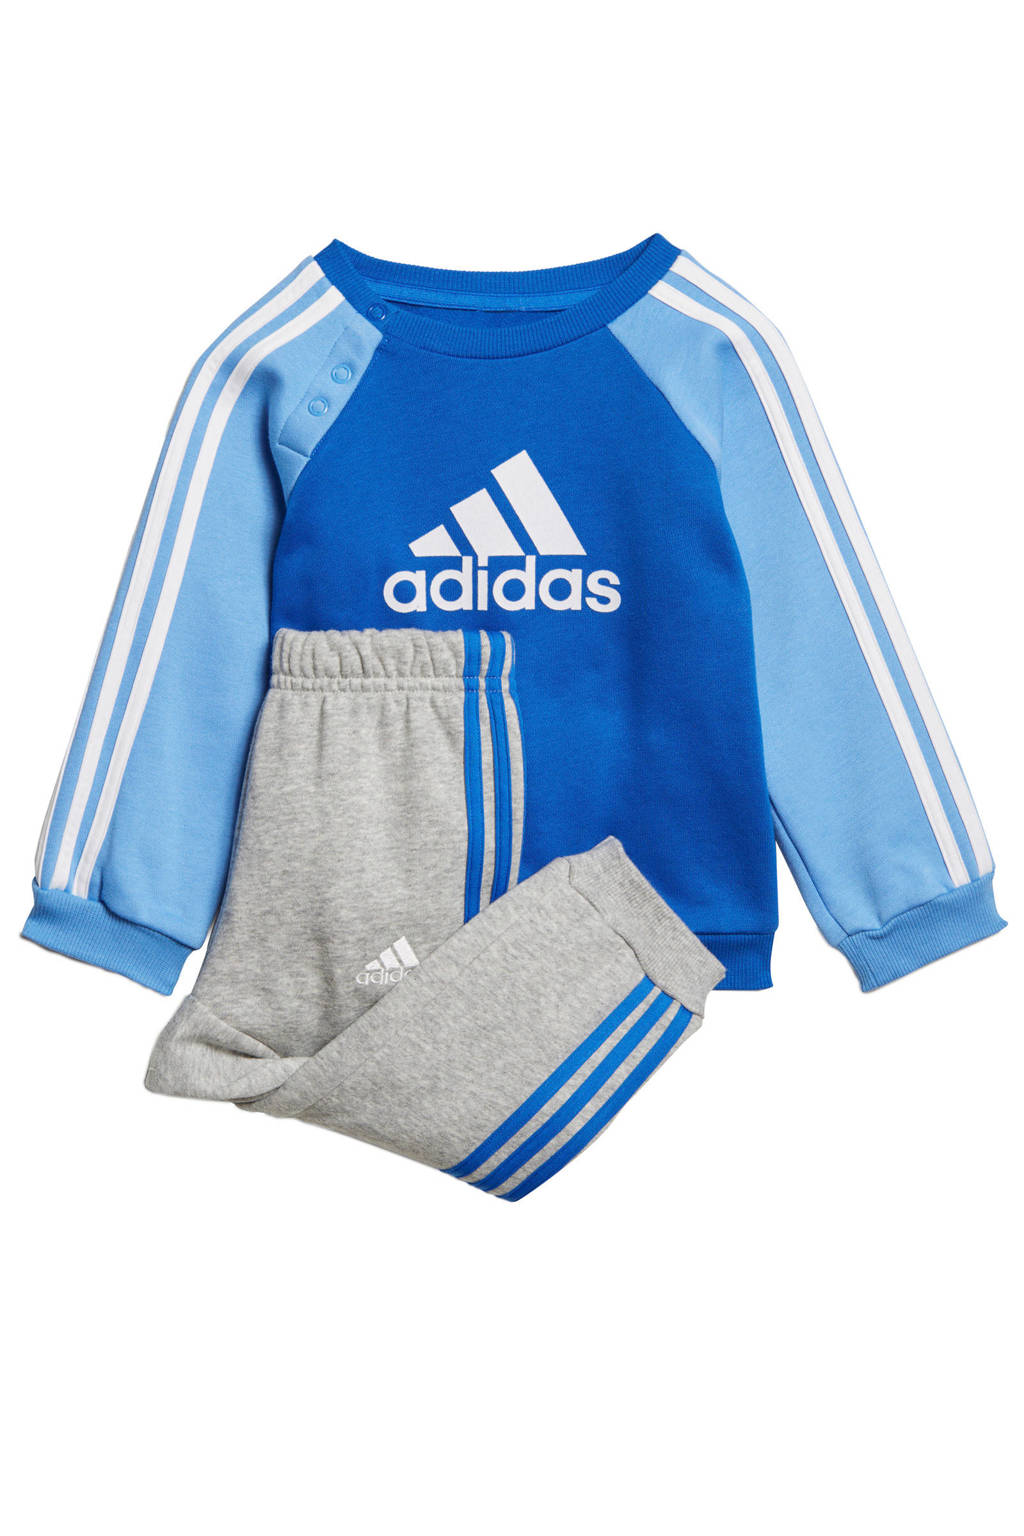 adidas   joggingpak blauw/grijs, Blauw/grijs/wit